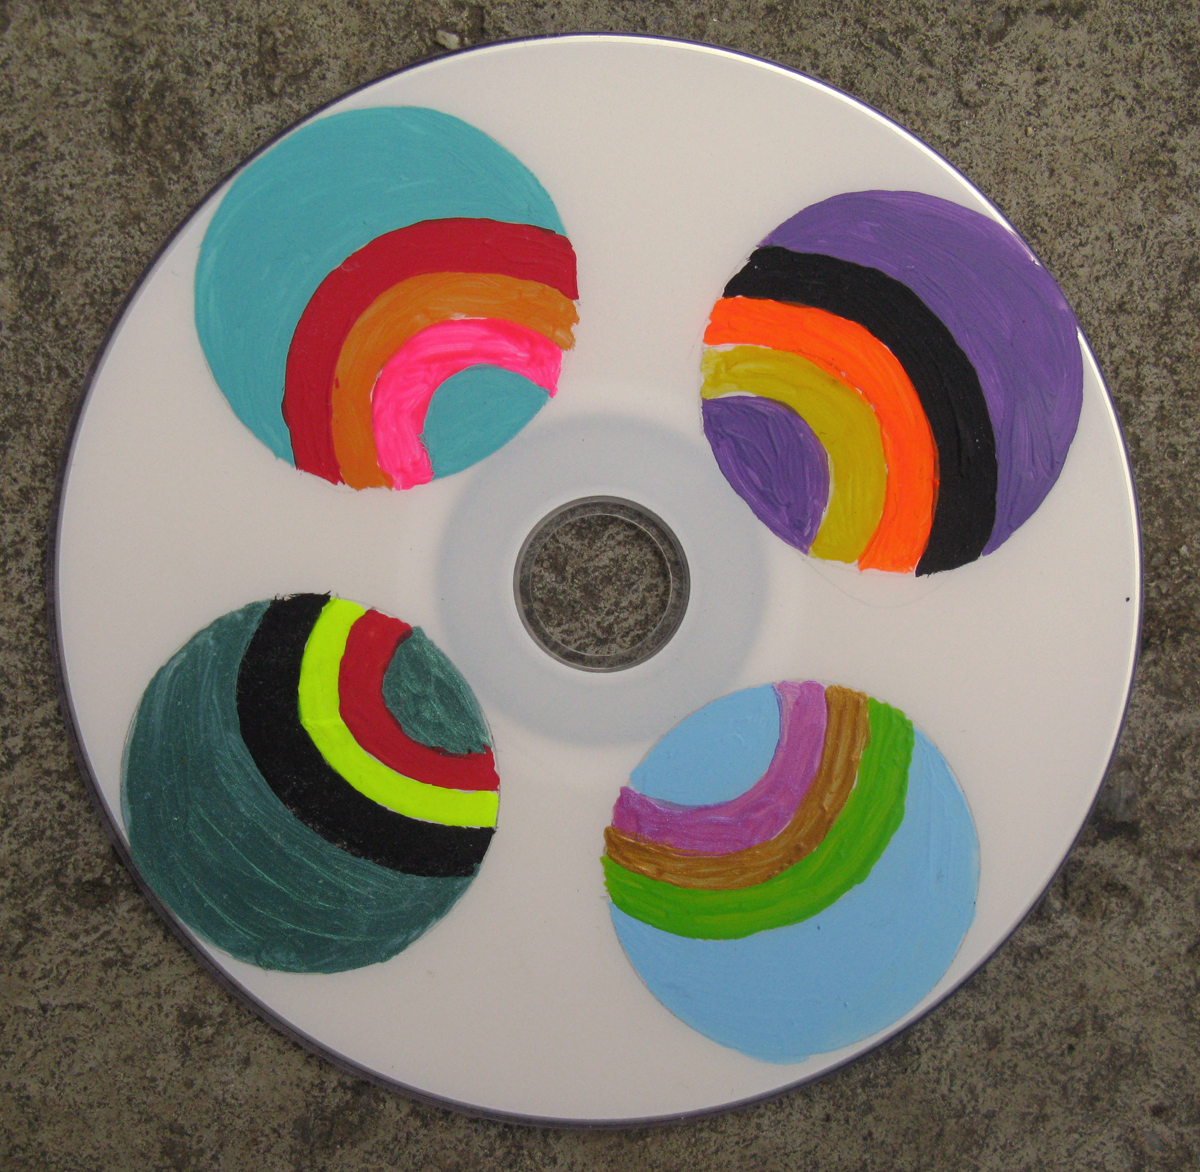 "CD Rohling "" Der Ball ist rund (90 min.)"", Acryl, 2020"